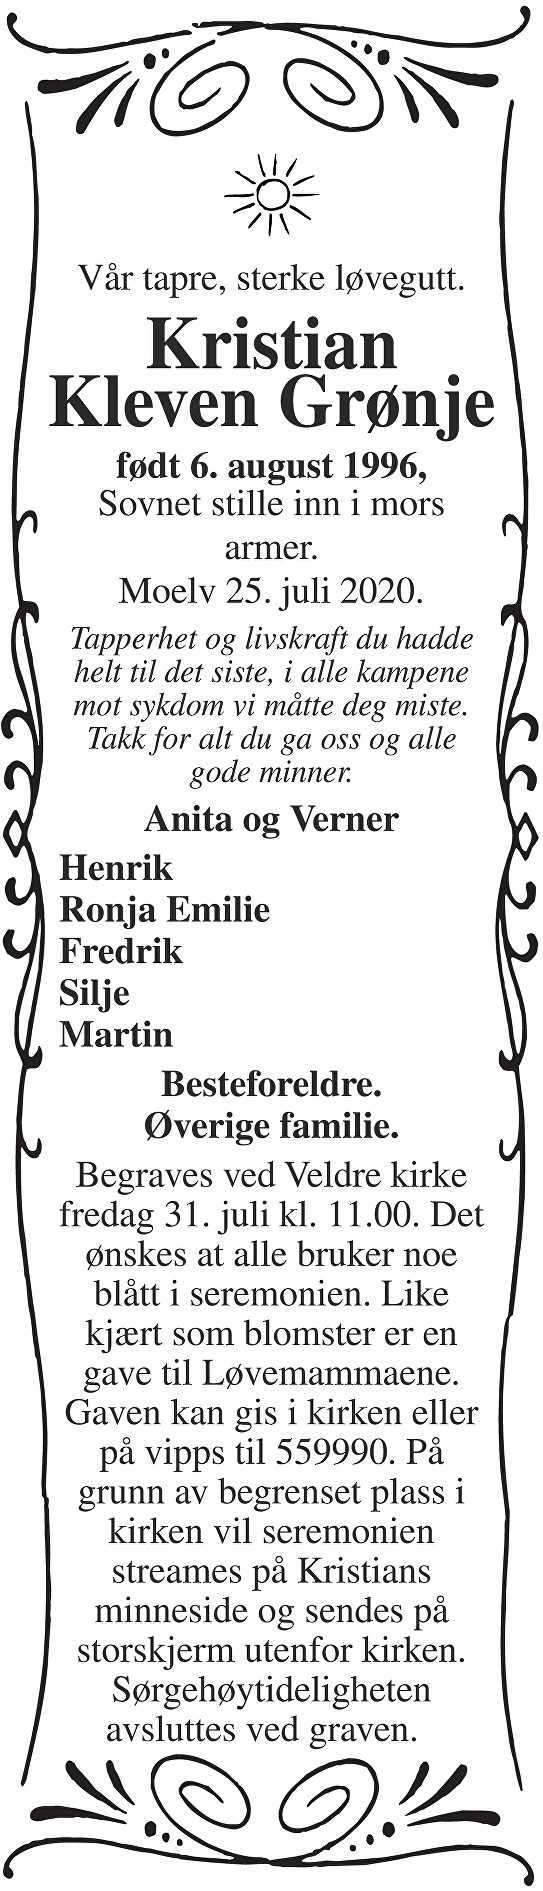 Kristian Kleven Grønje Dødsannonse